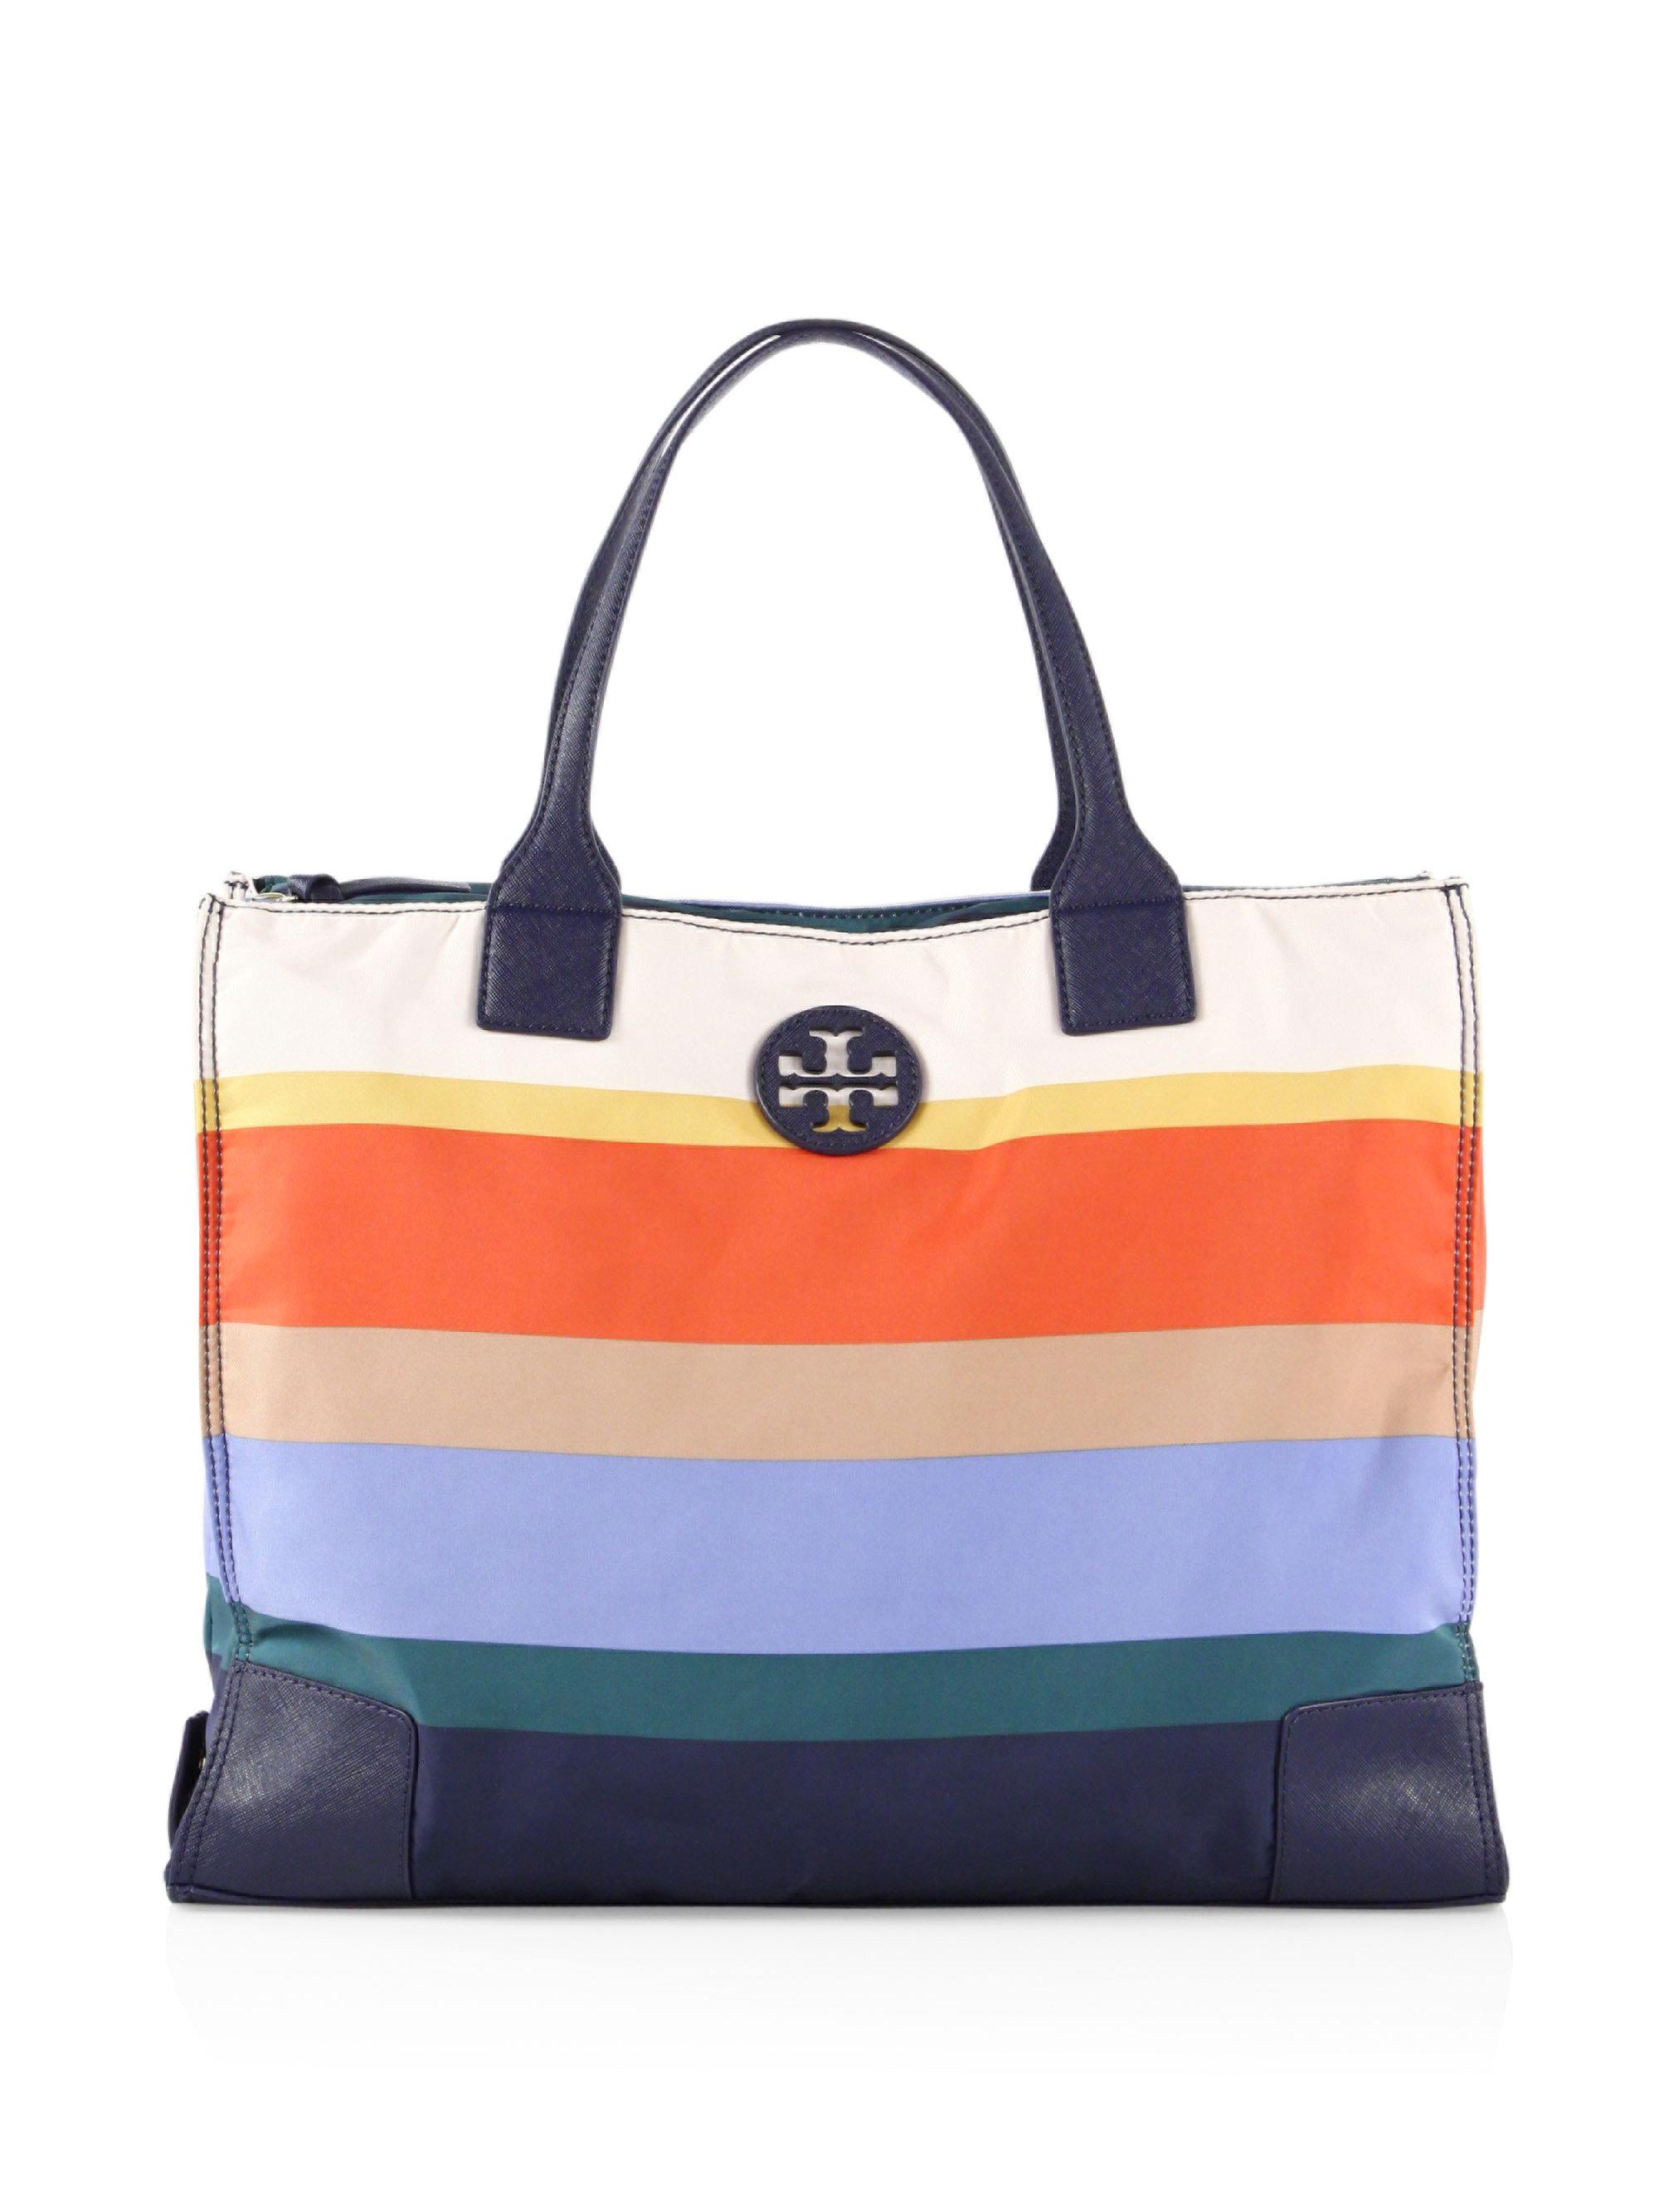 17eb2c703d85 Lyst - Tory Burch Ella Packable Printed Journey Stripe Tote